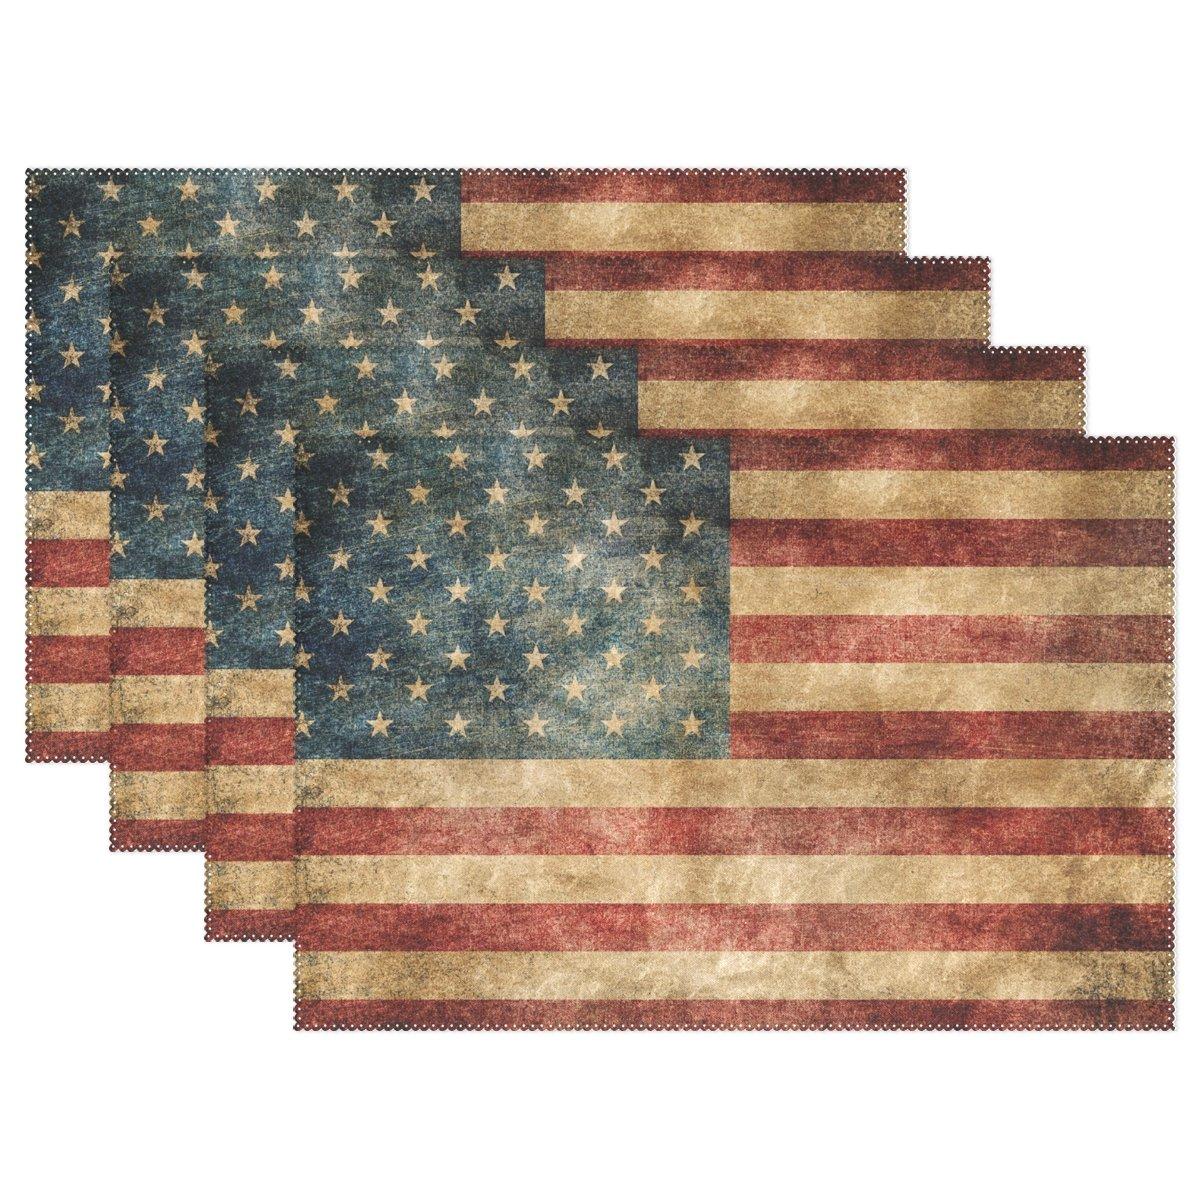 WozoヴィンテージAmerican USA Flagプレースマットテーブルマット、7月4日Independence Day国旗12